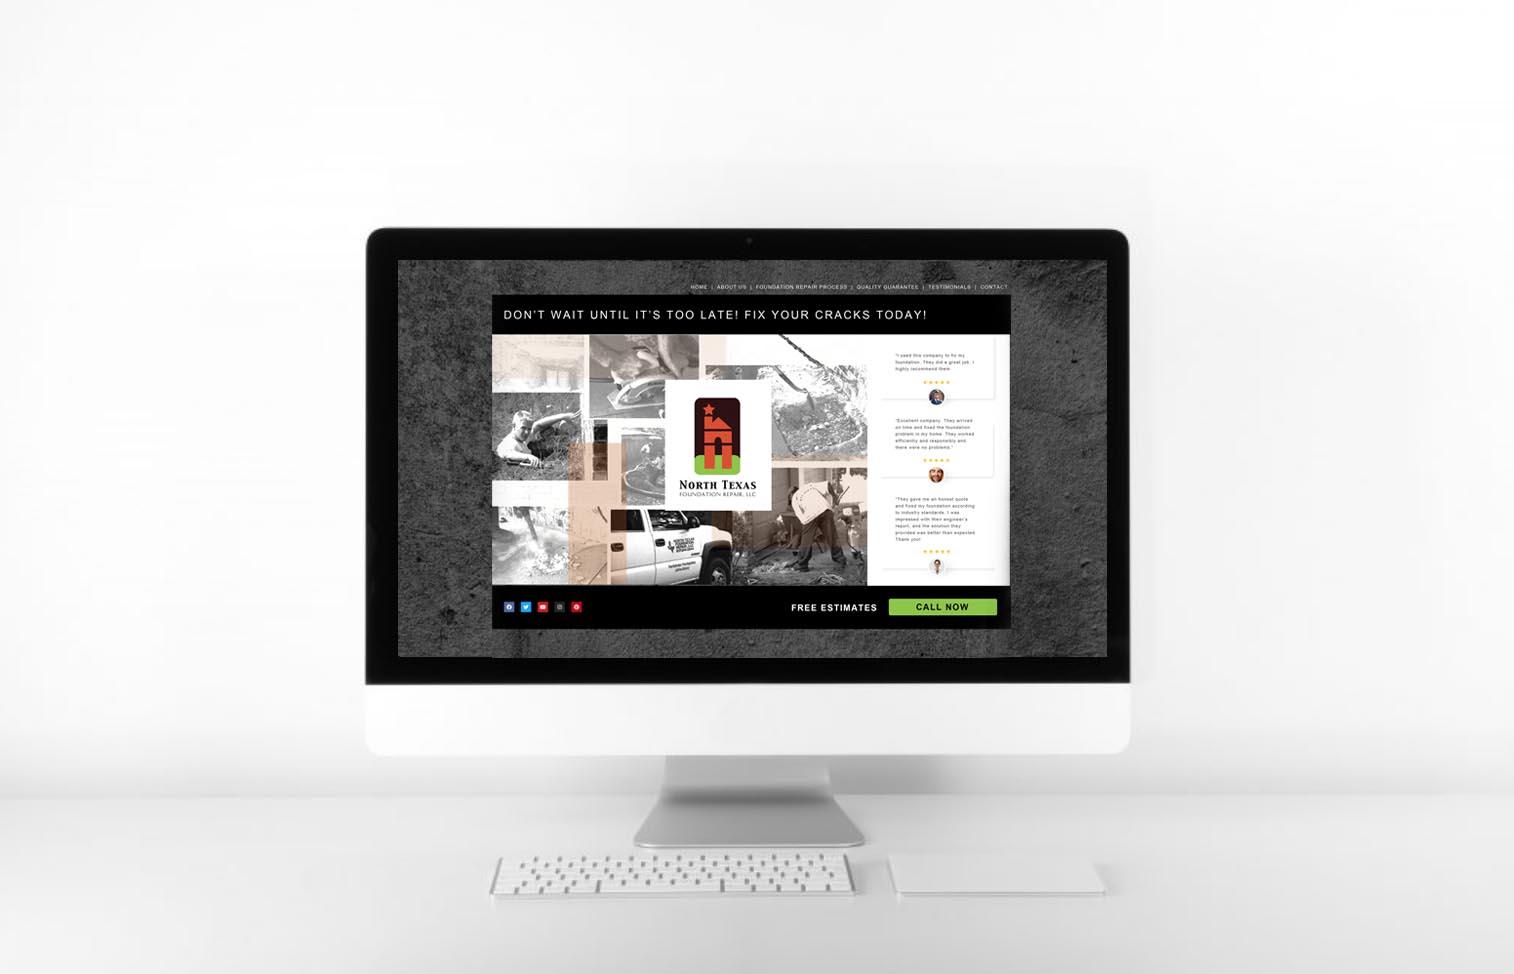 desktop-NTFR-website-design-company-2